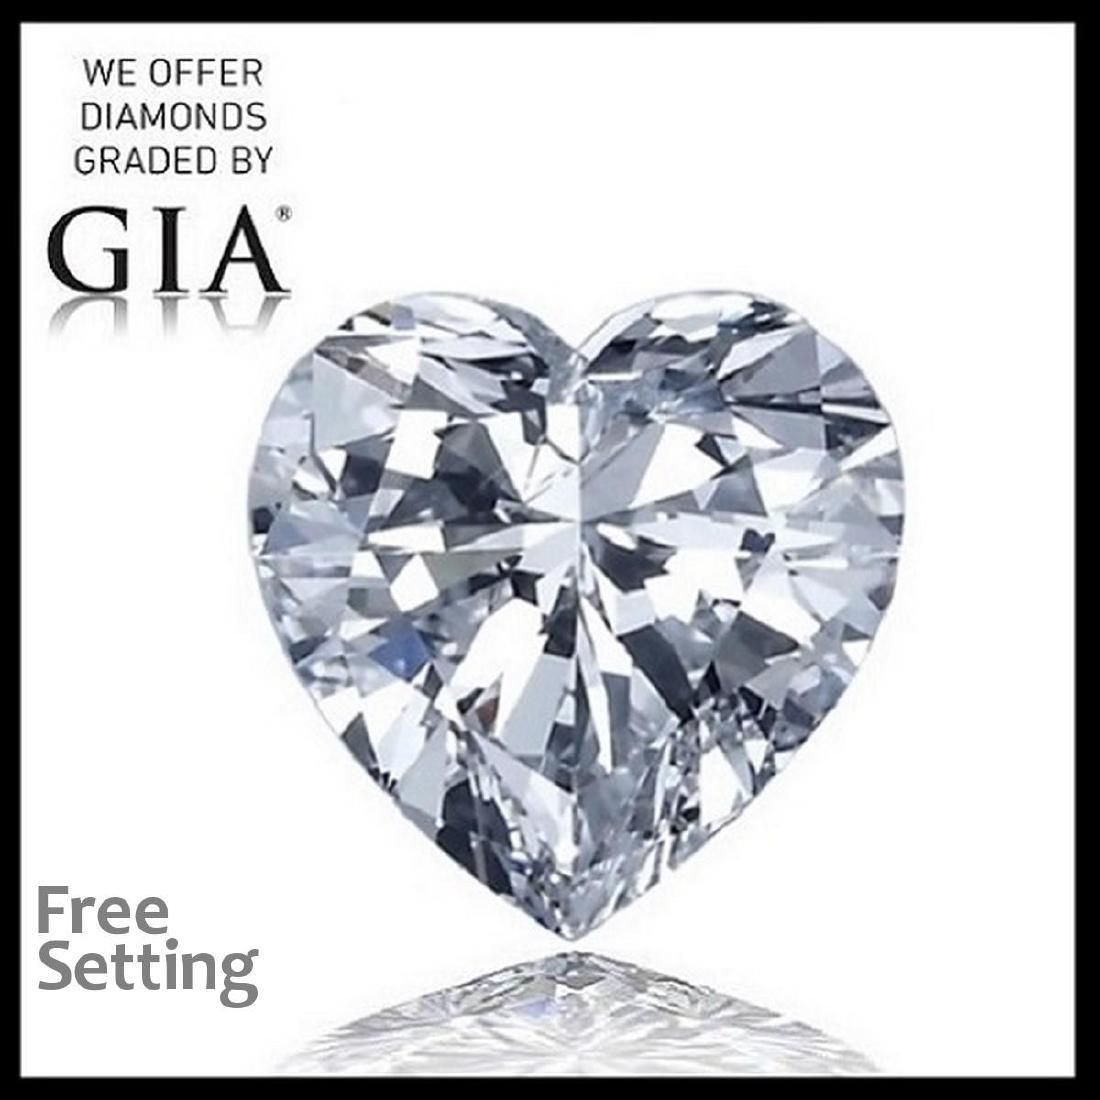 5.07 ct, Color D/VS2, Heart cut Diamond